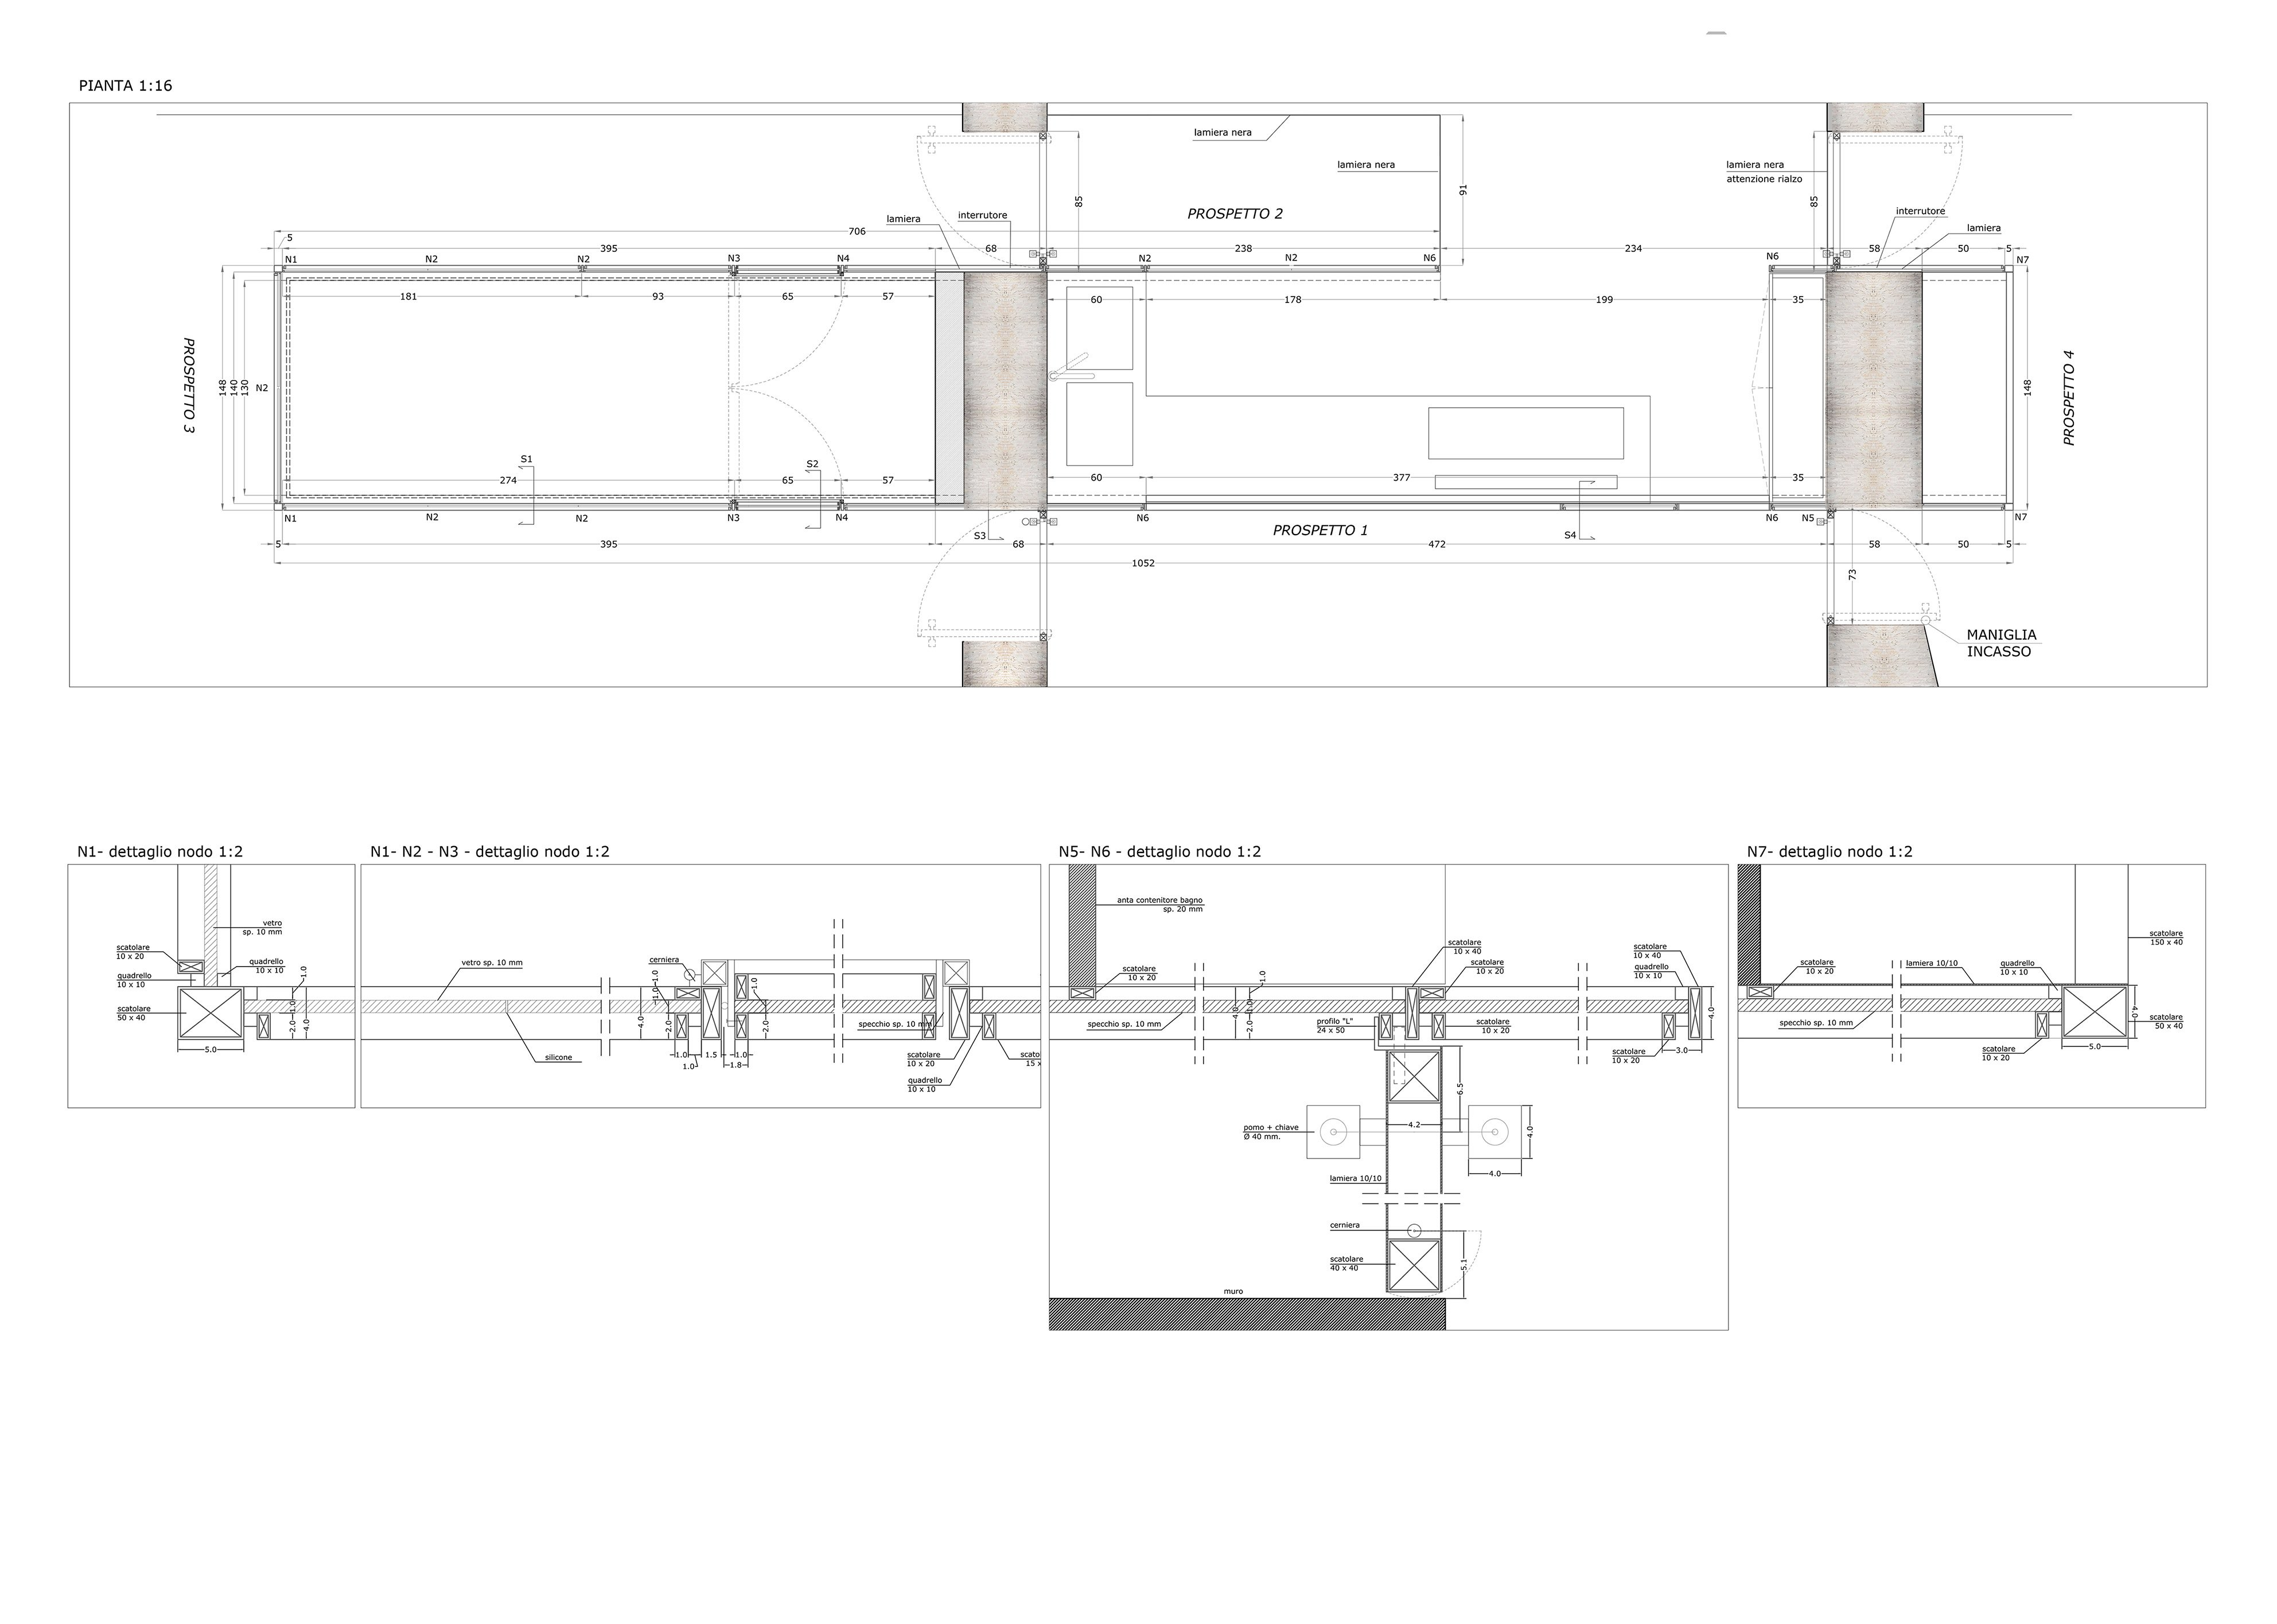 Plan Details of Glazed Volume }